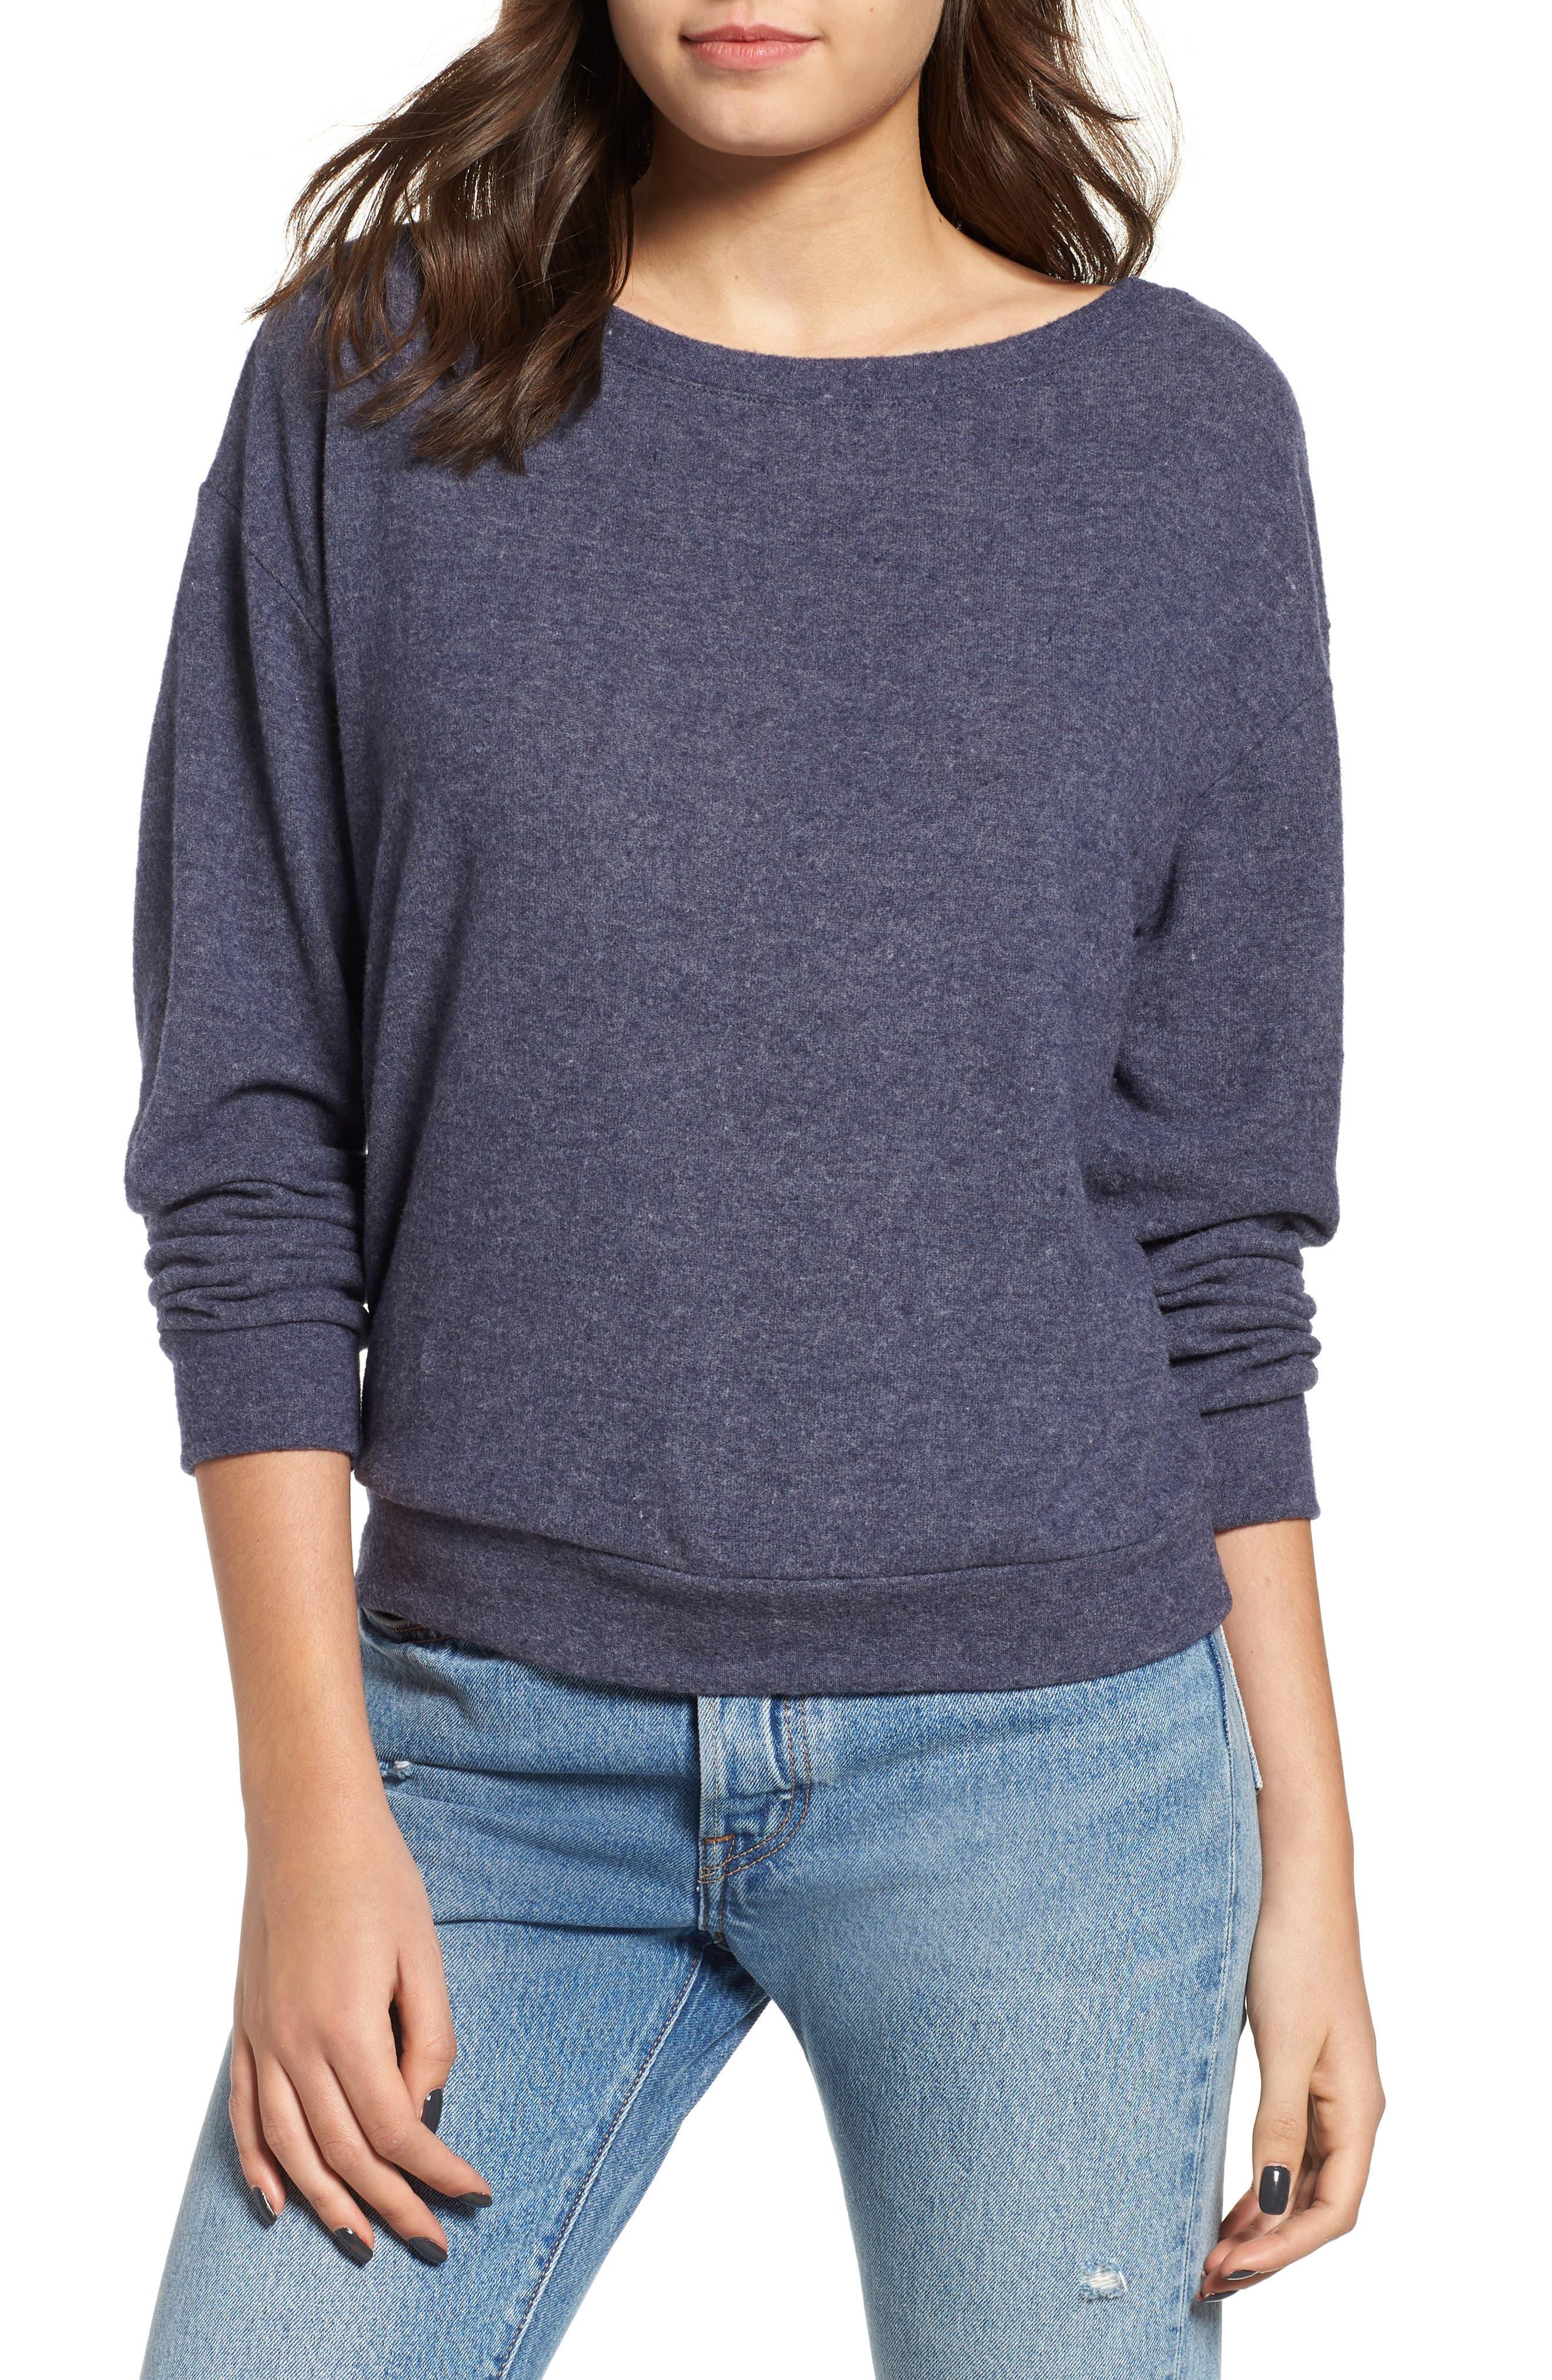 Keys Sweatshirt,                         Main,                         color, HEATHER NAVY